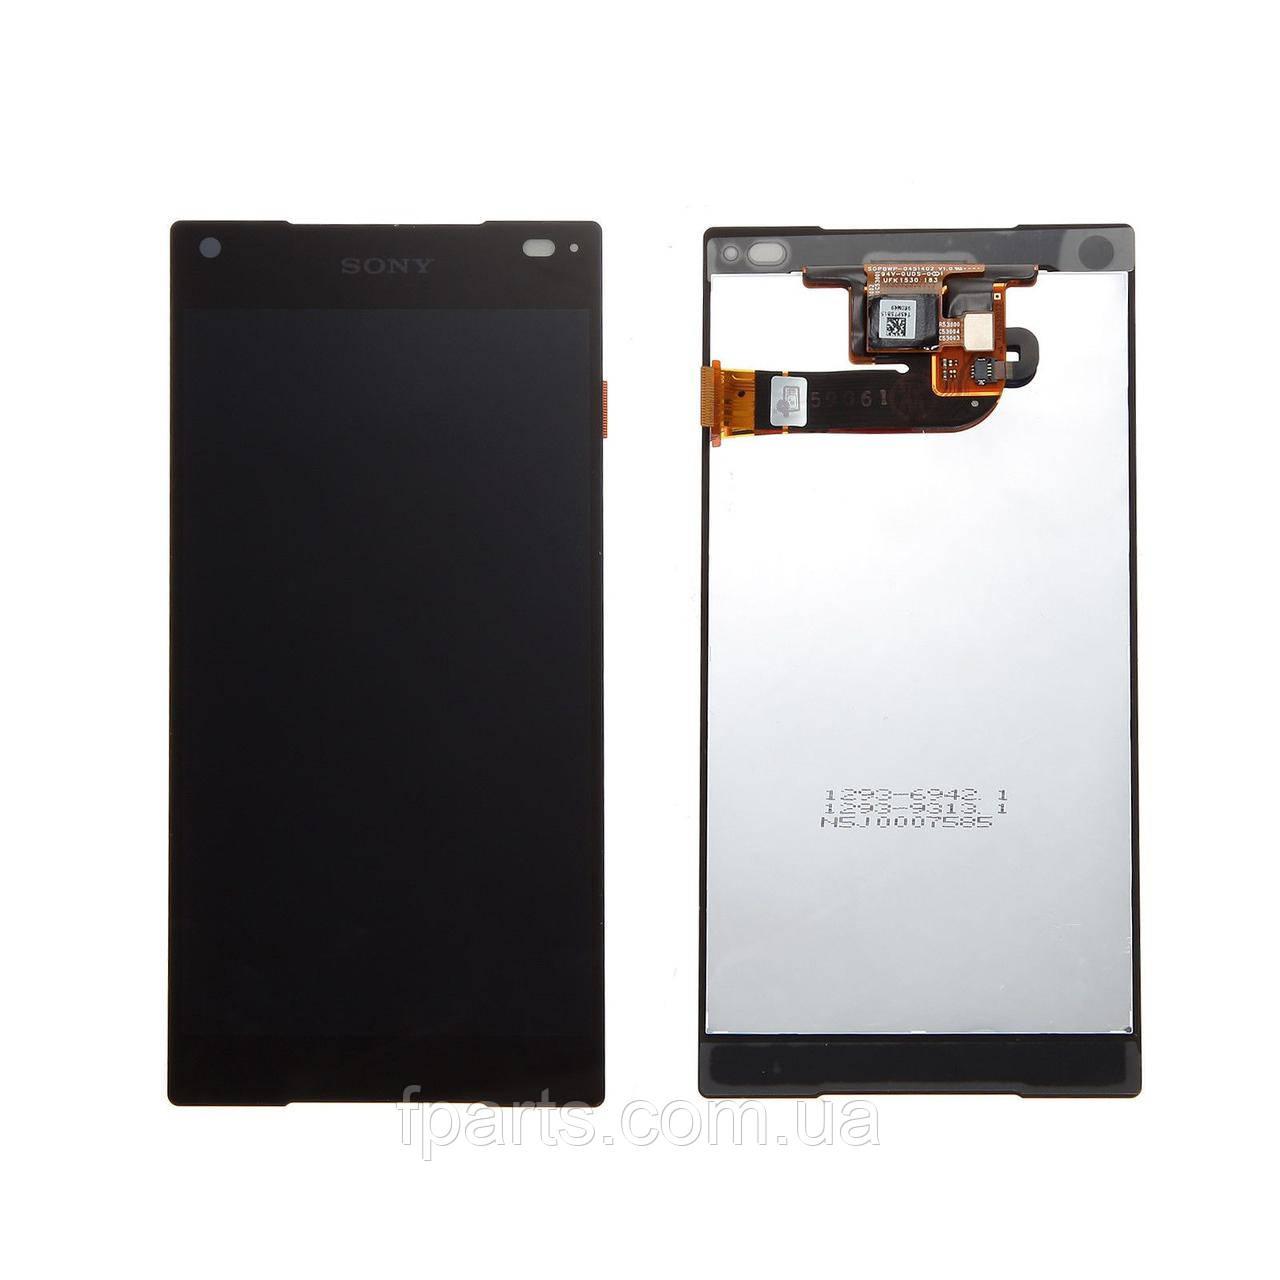 Дисплей для Sony Xperia Z5 Compact E5803, E5823 с тачскрином (Black)